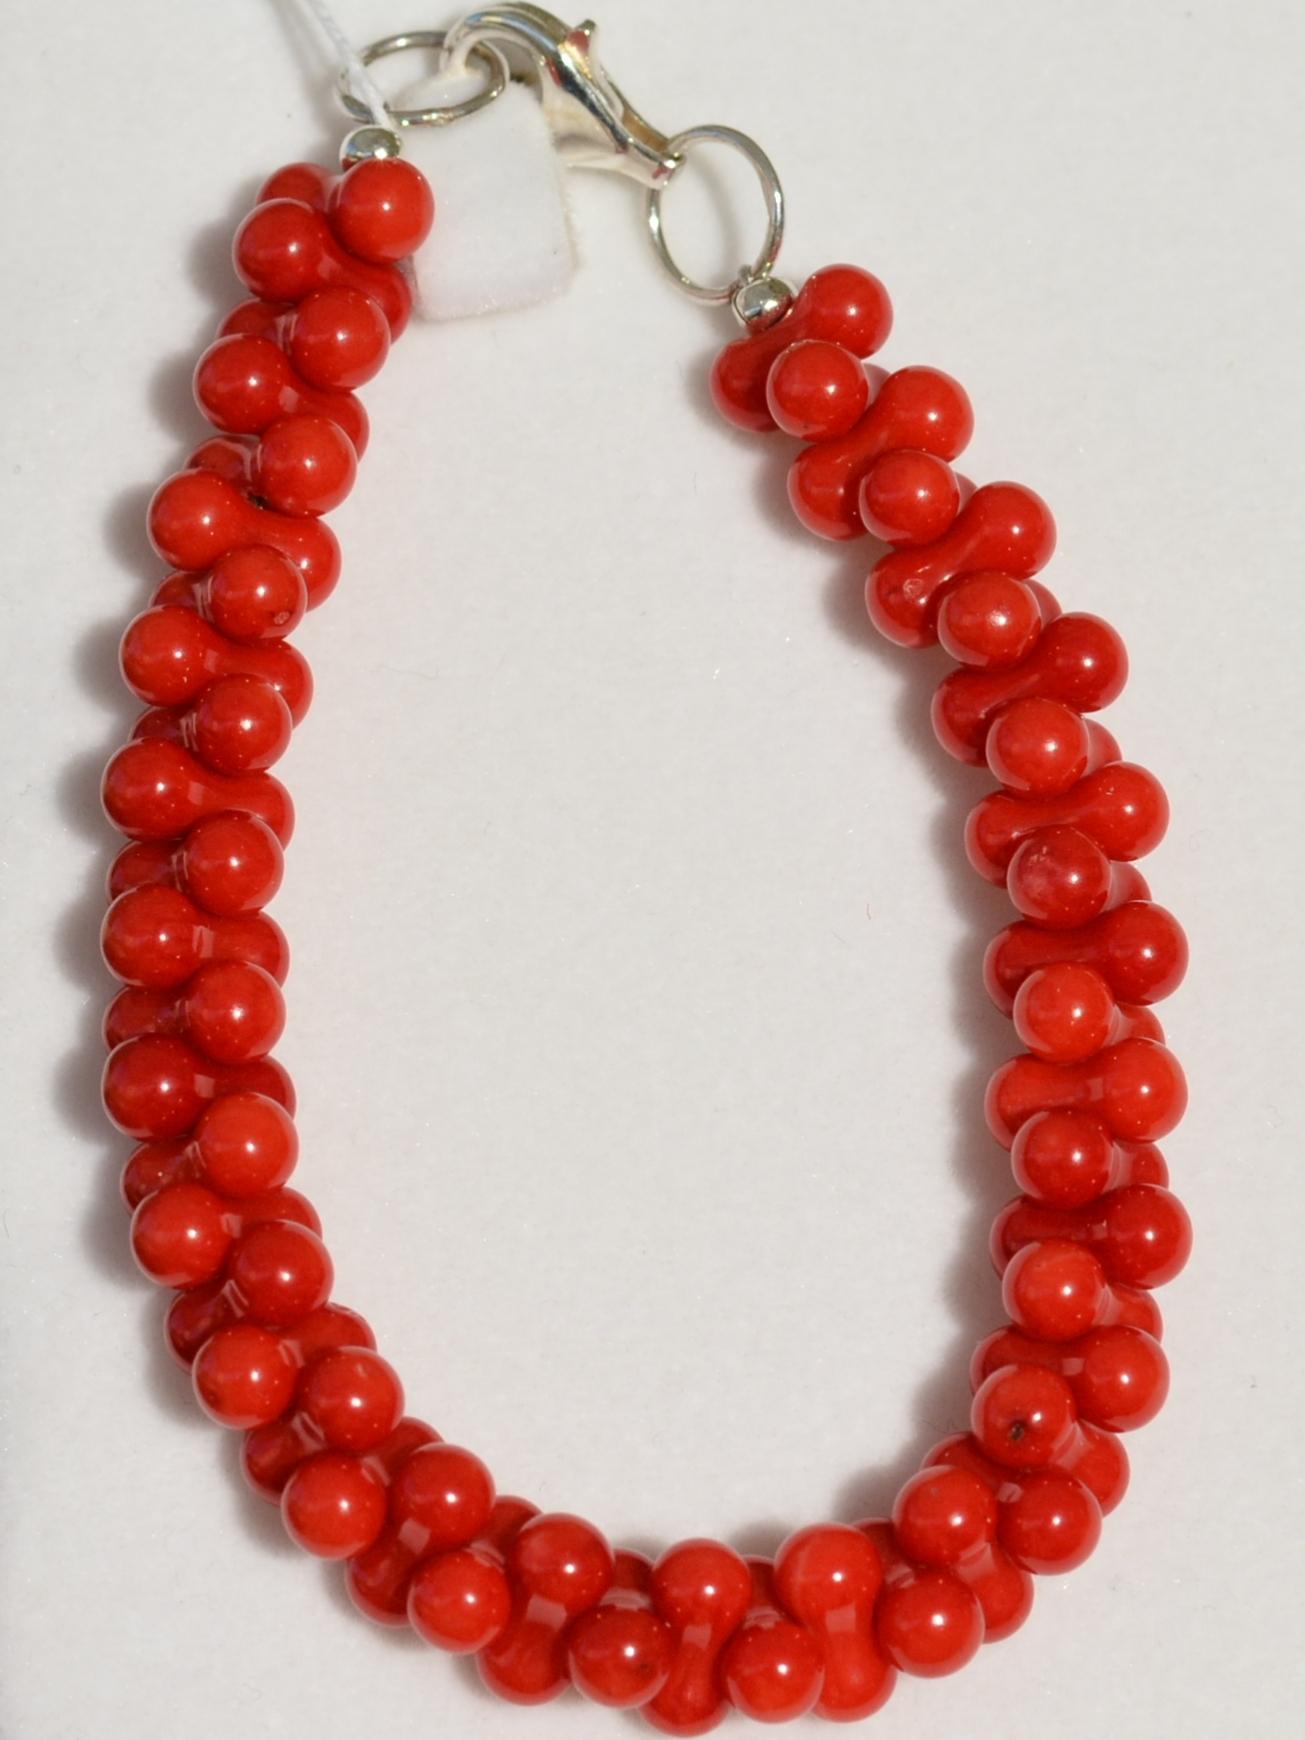 Коралл-аа (браслет из натуральных камней)